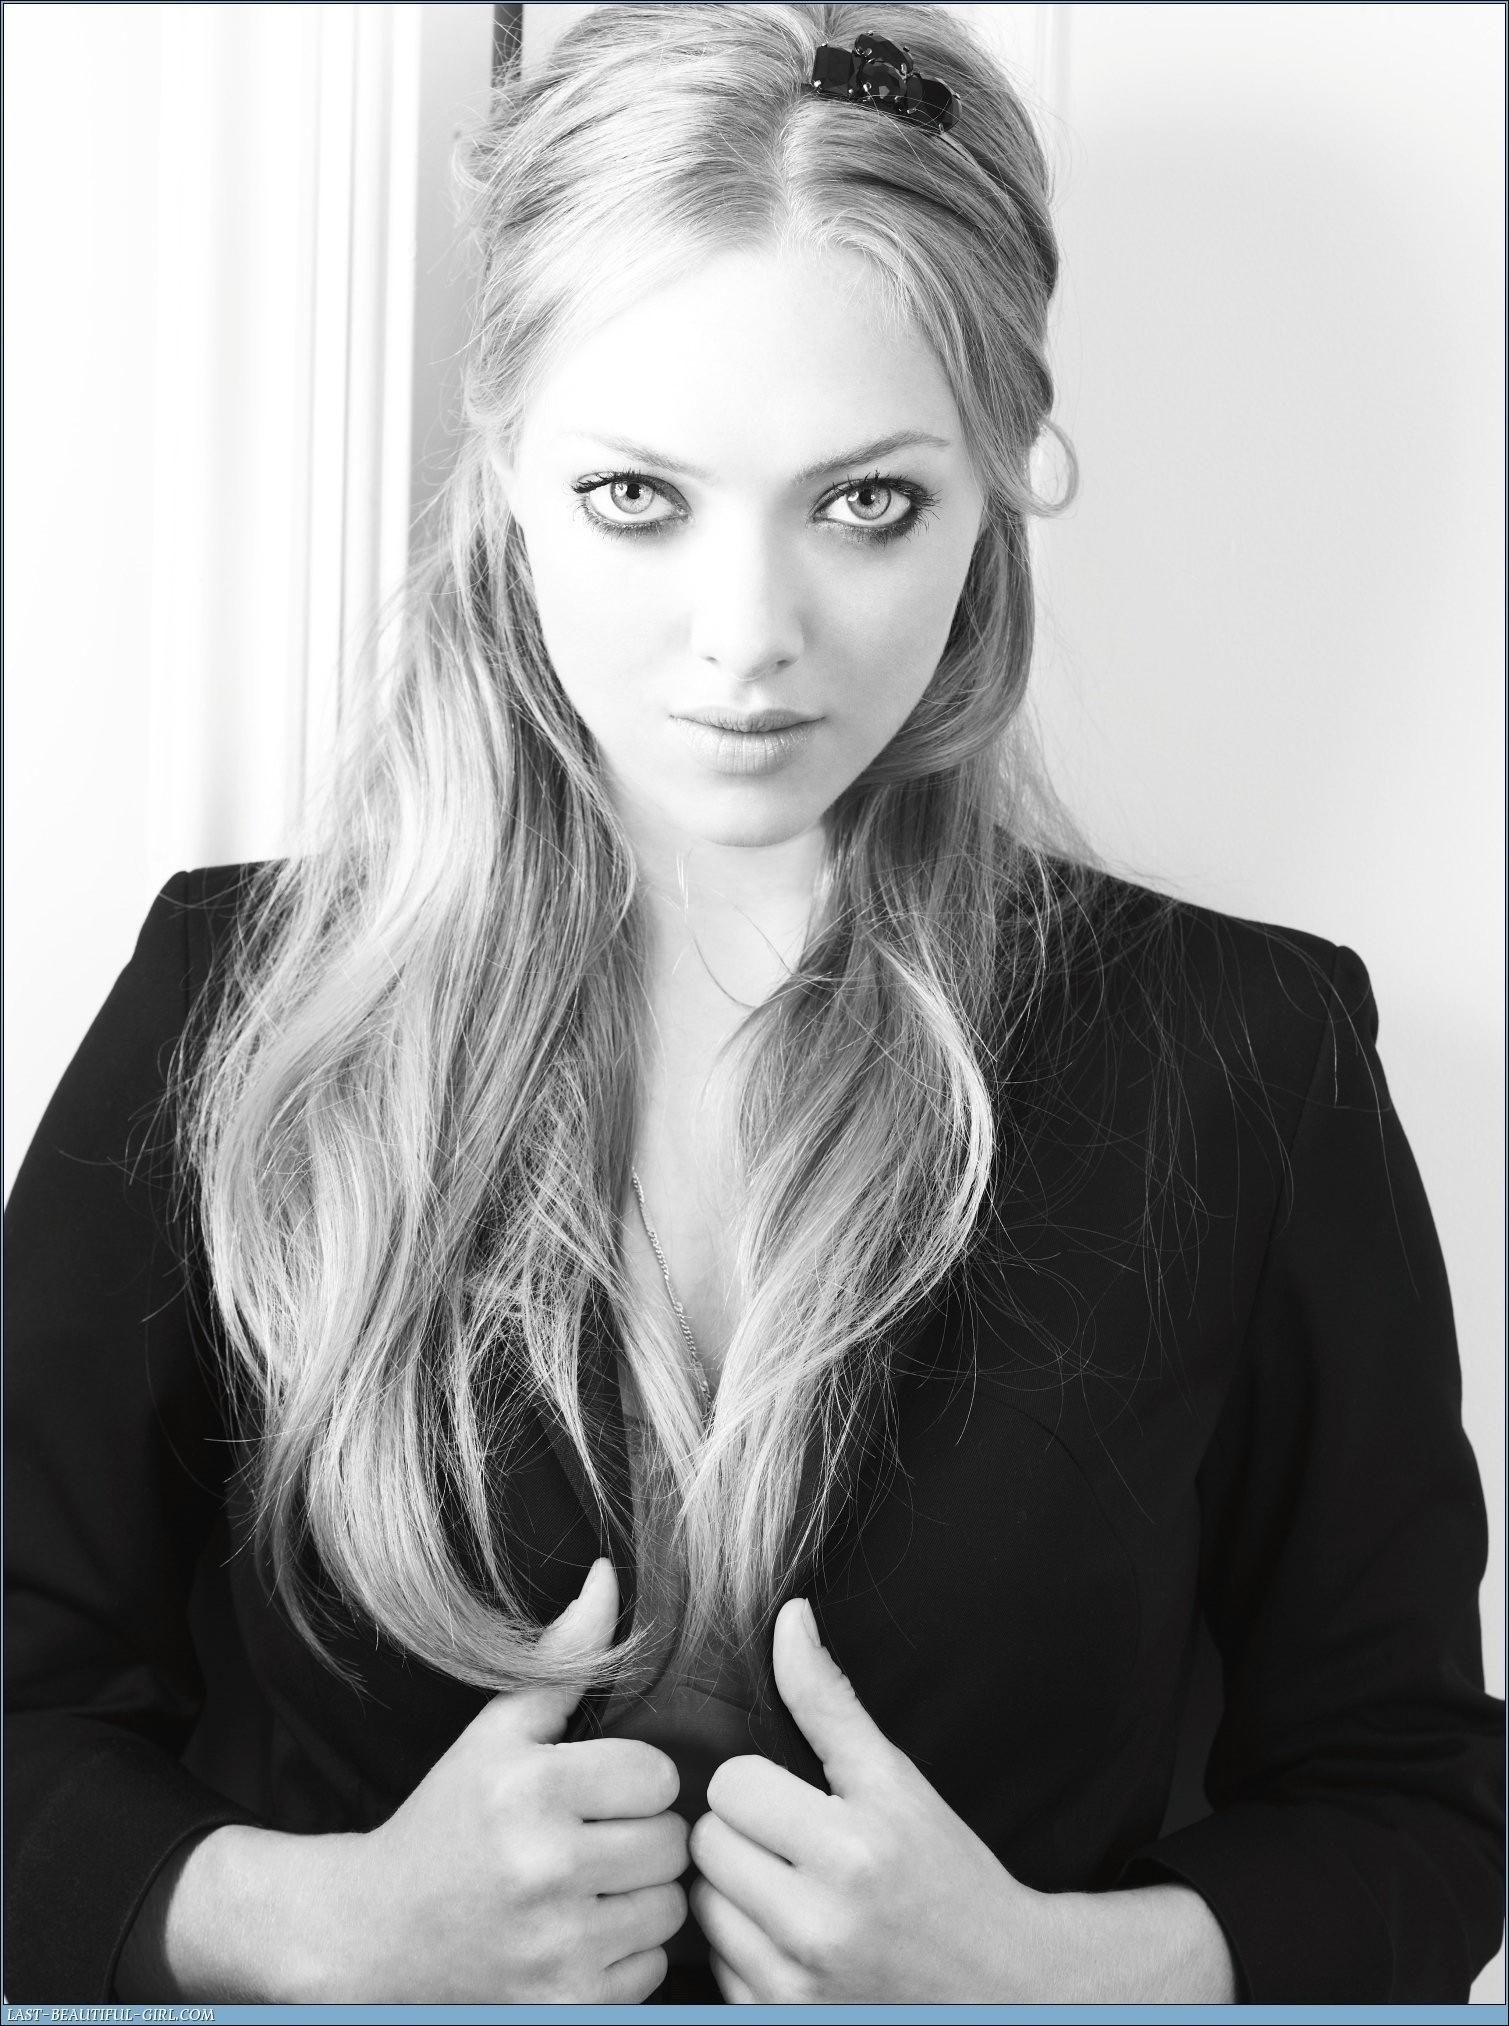 Amanda Seyfried Nude Big Love amanda seyfried - karen smith from mean girls, big love